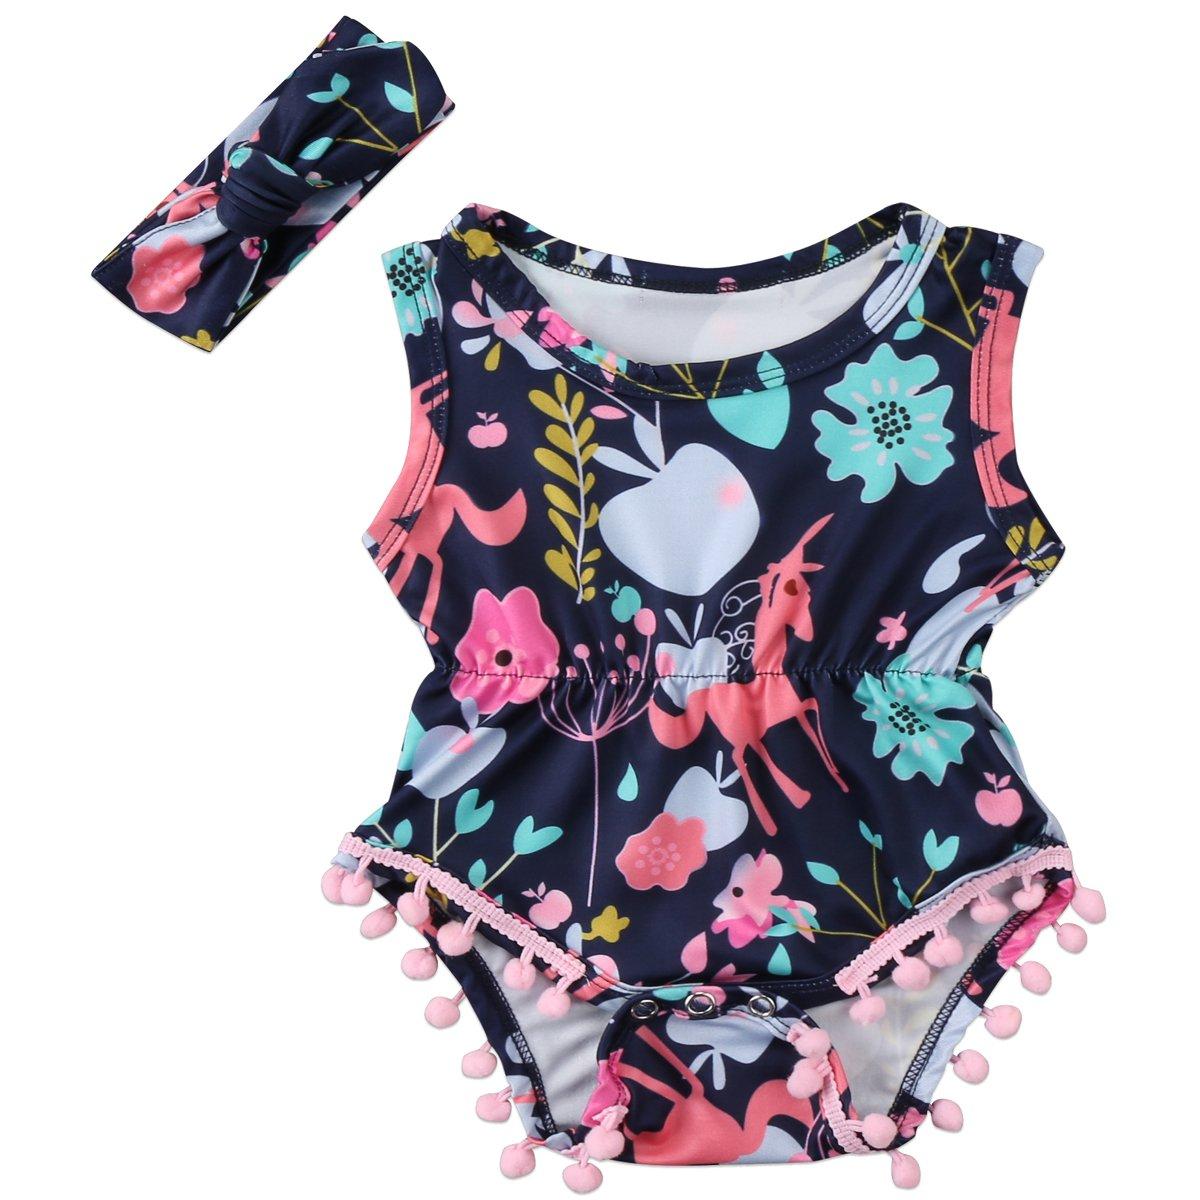 Annvivi Newborn Toddler Baby Girls' Floral Summer Outfit Pompom Romper Headband